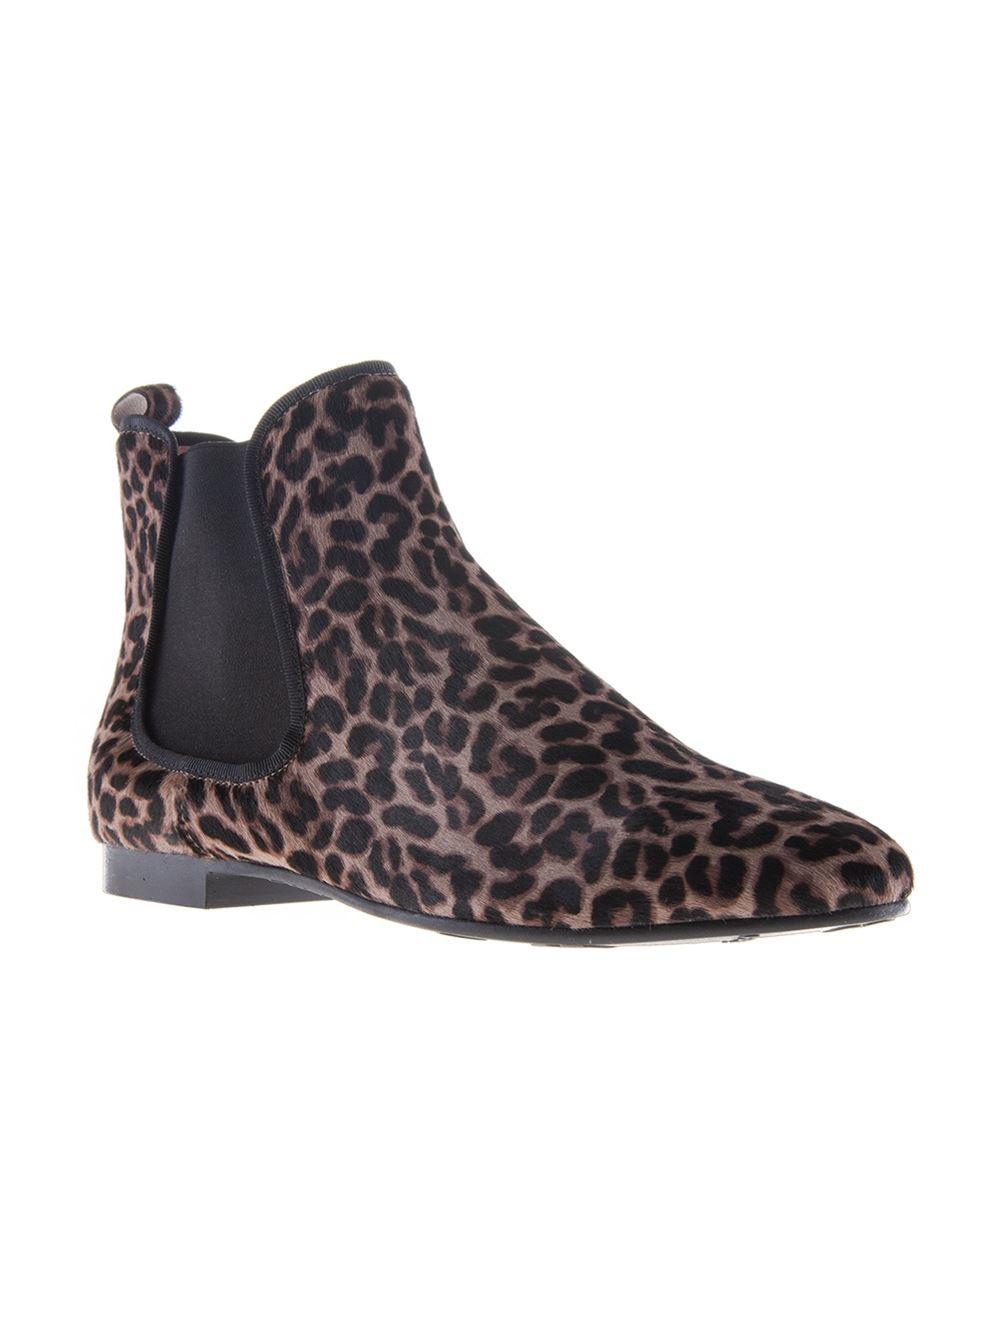 987c97fd83e0 Lyst pretty ballerinas leopard print chelsea boots in black jpg 1000x1334 Black  leopard print boots